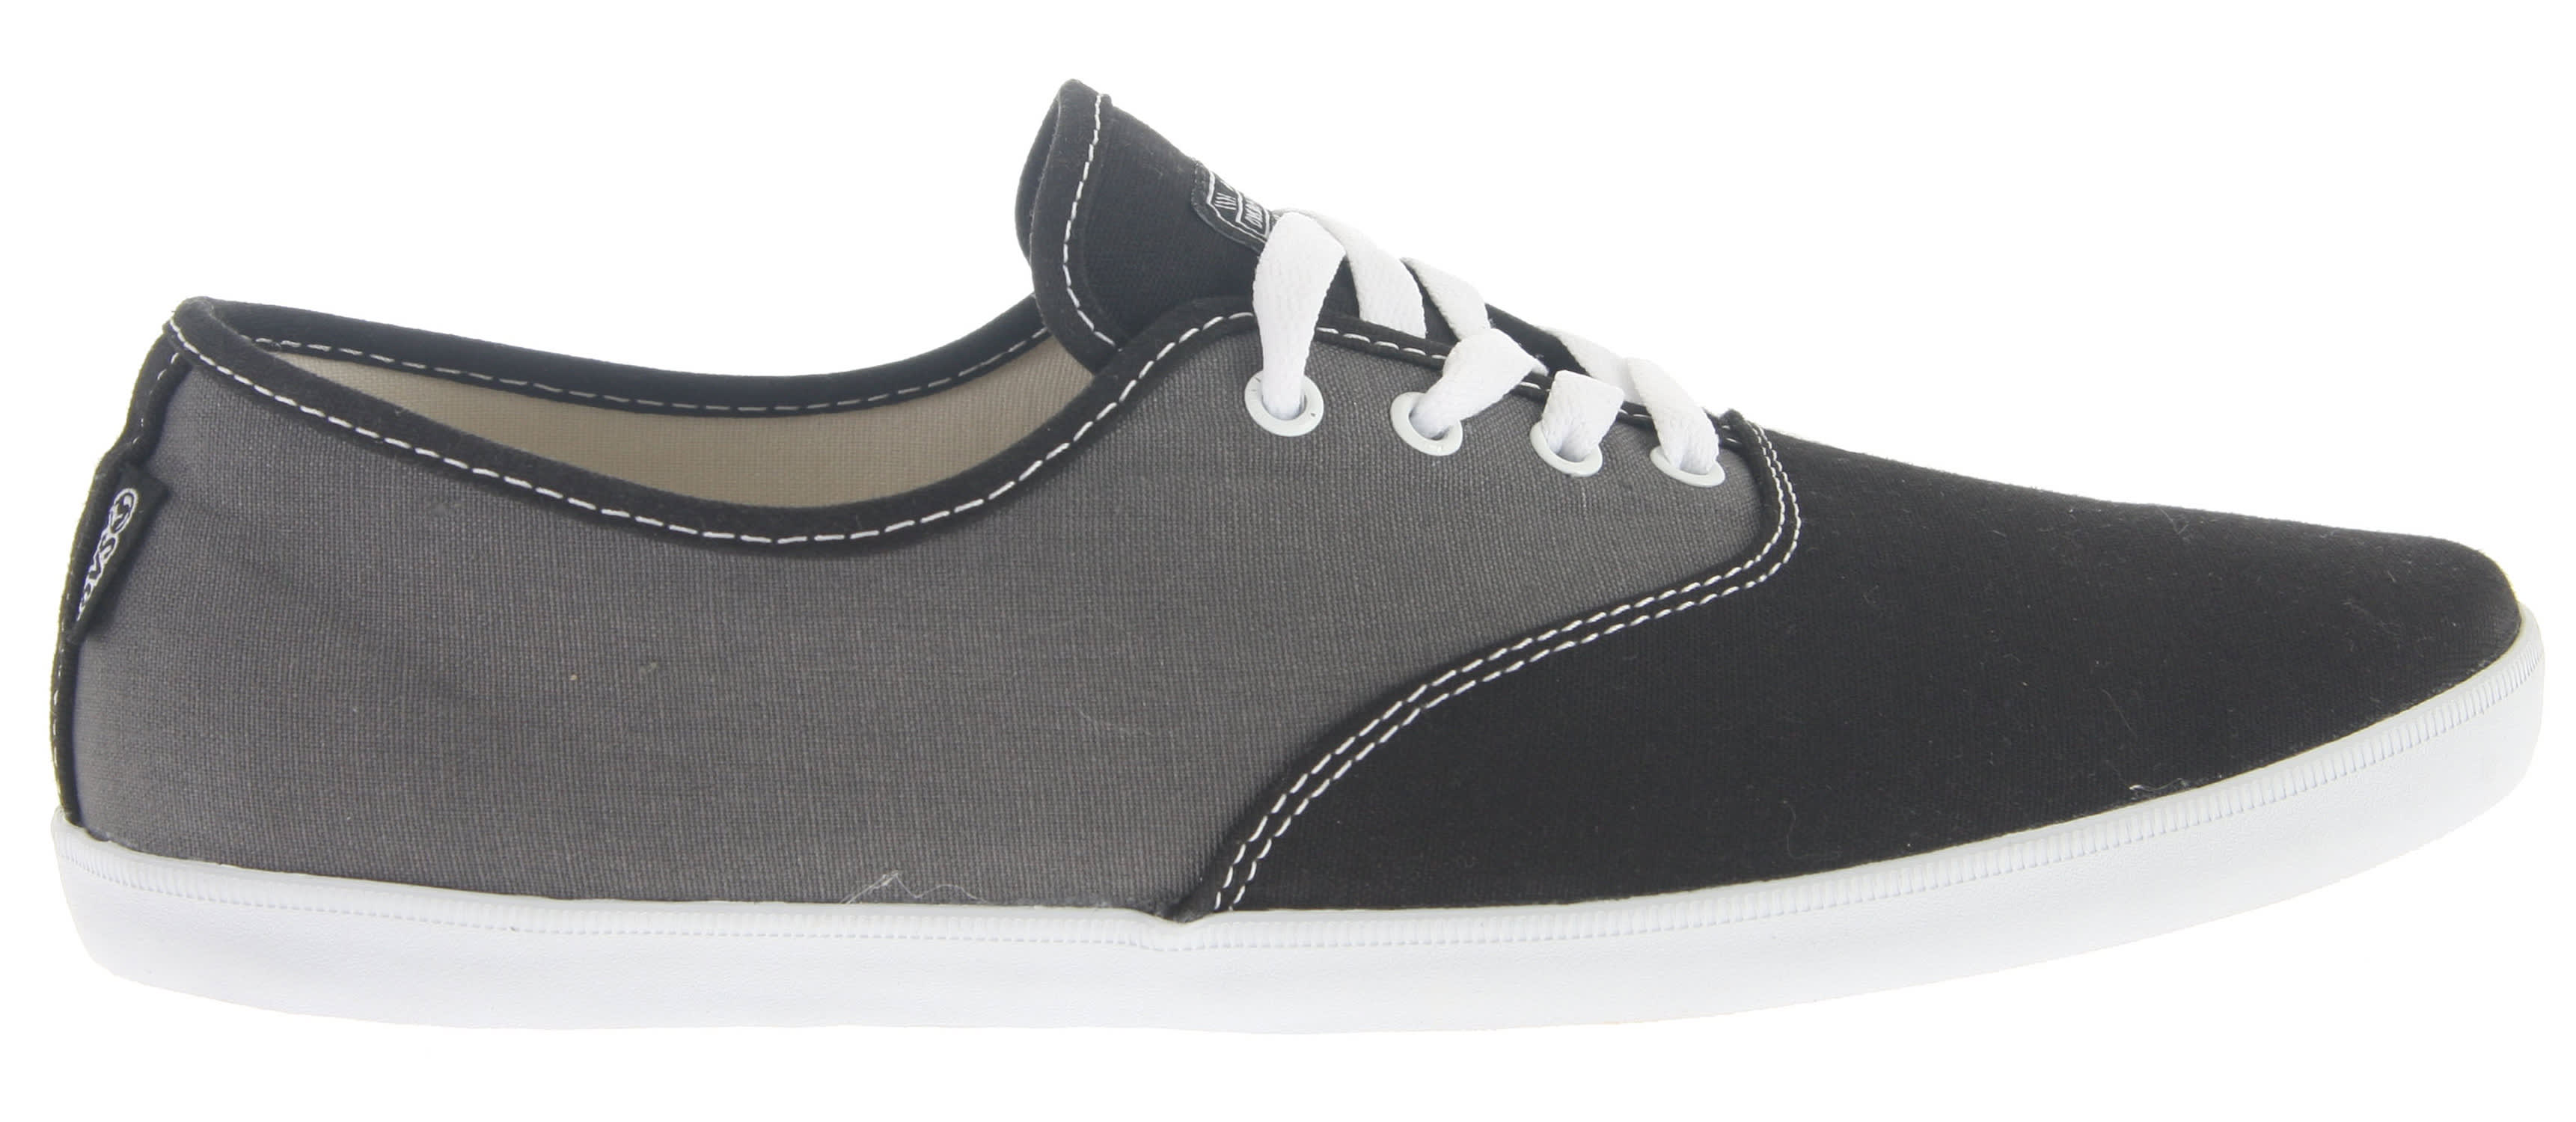 Discount Dvs Womens Shoes